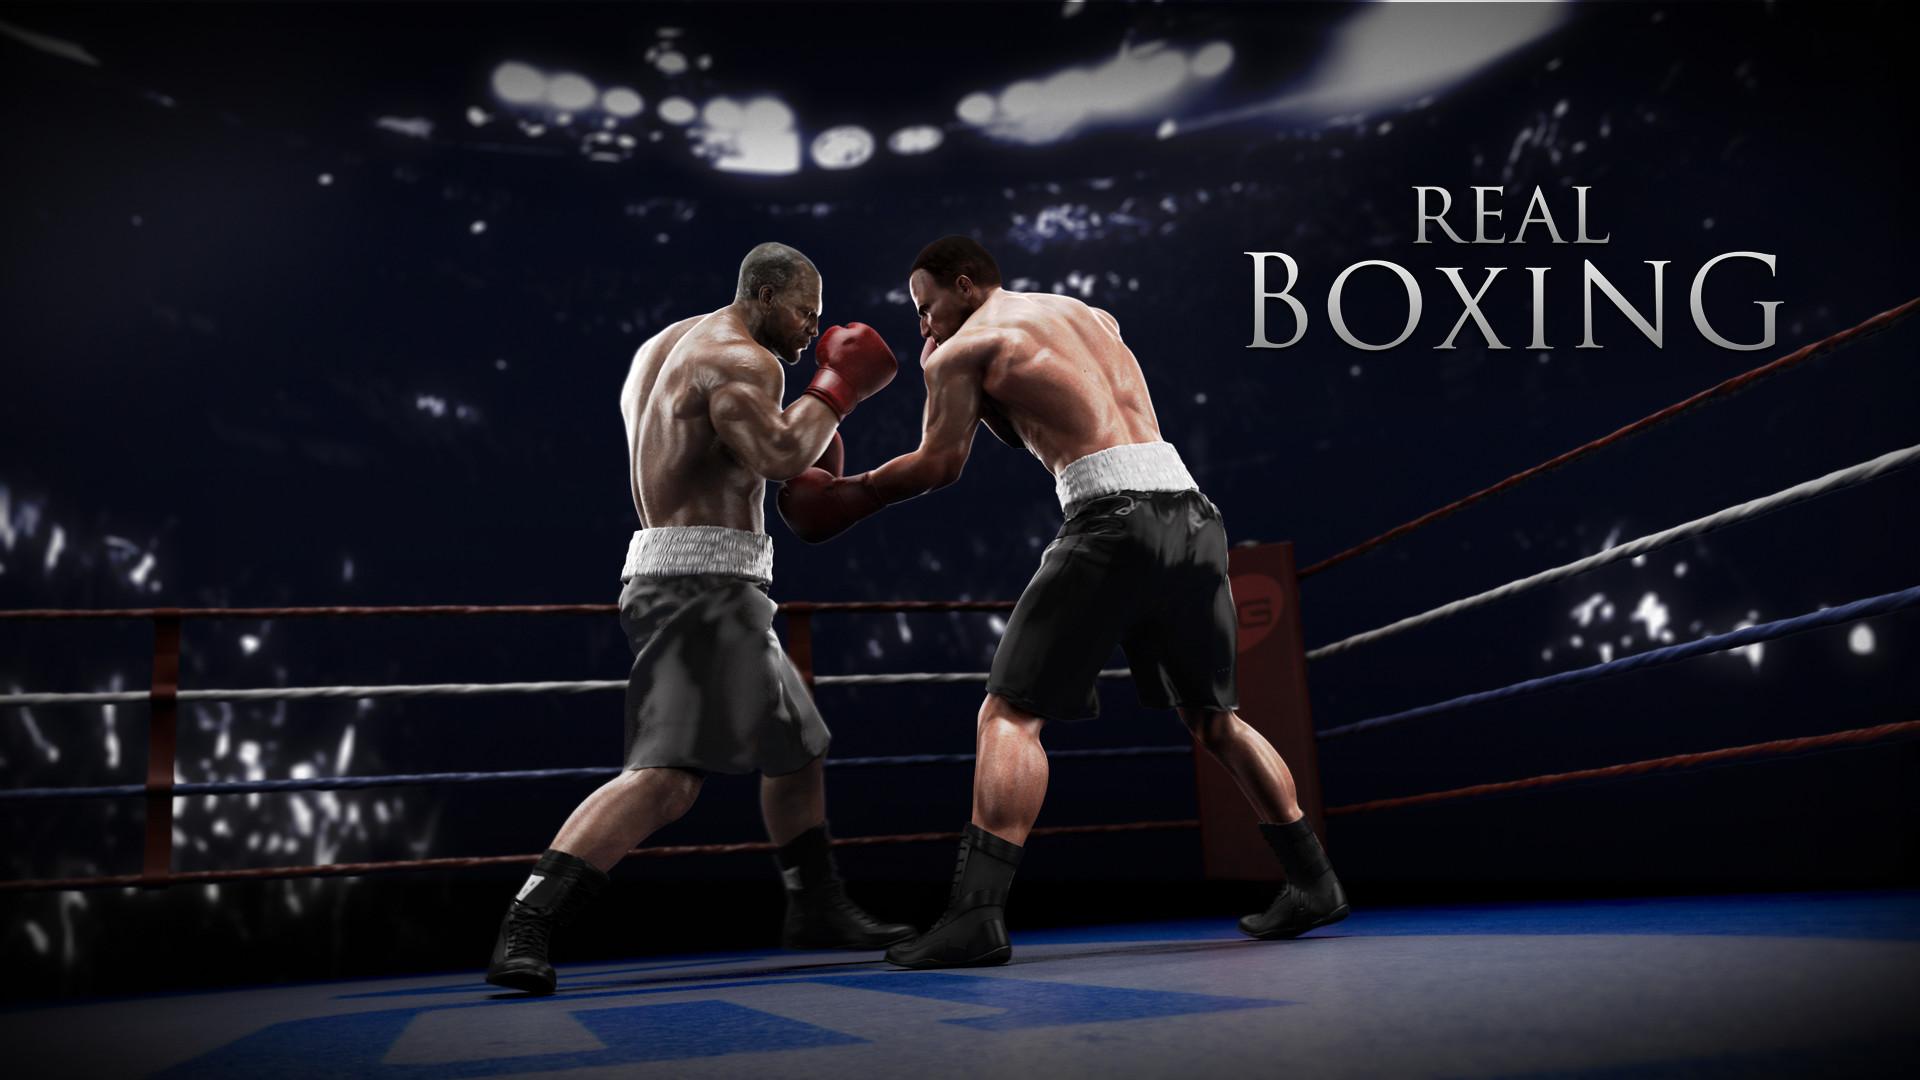 Boxing Ring Wallpaper 1